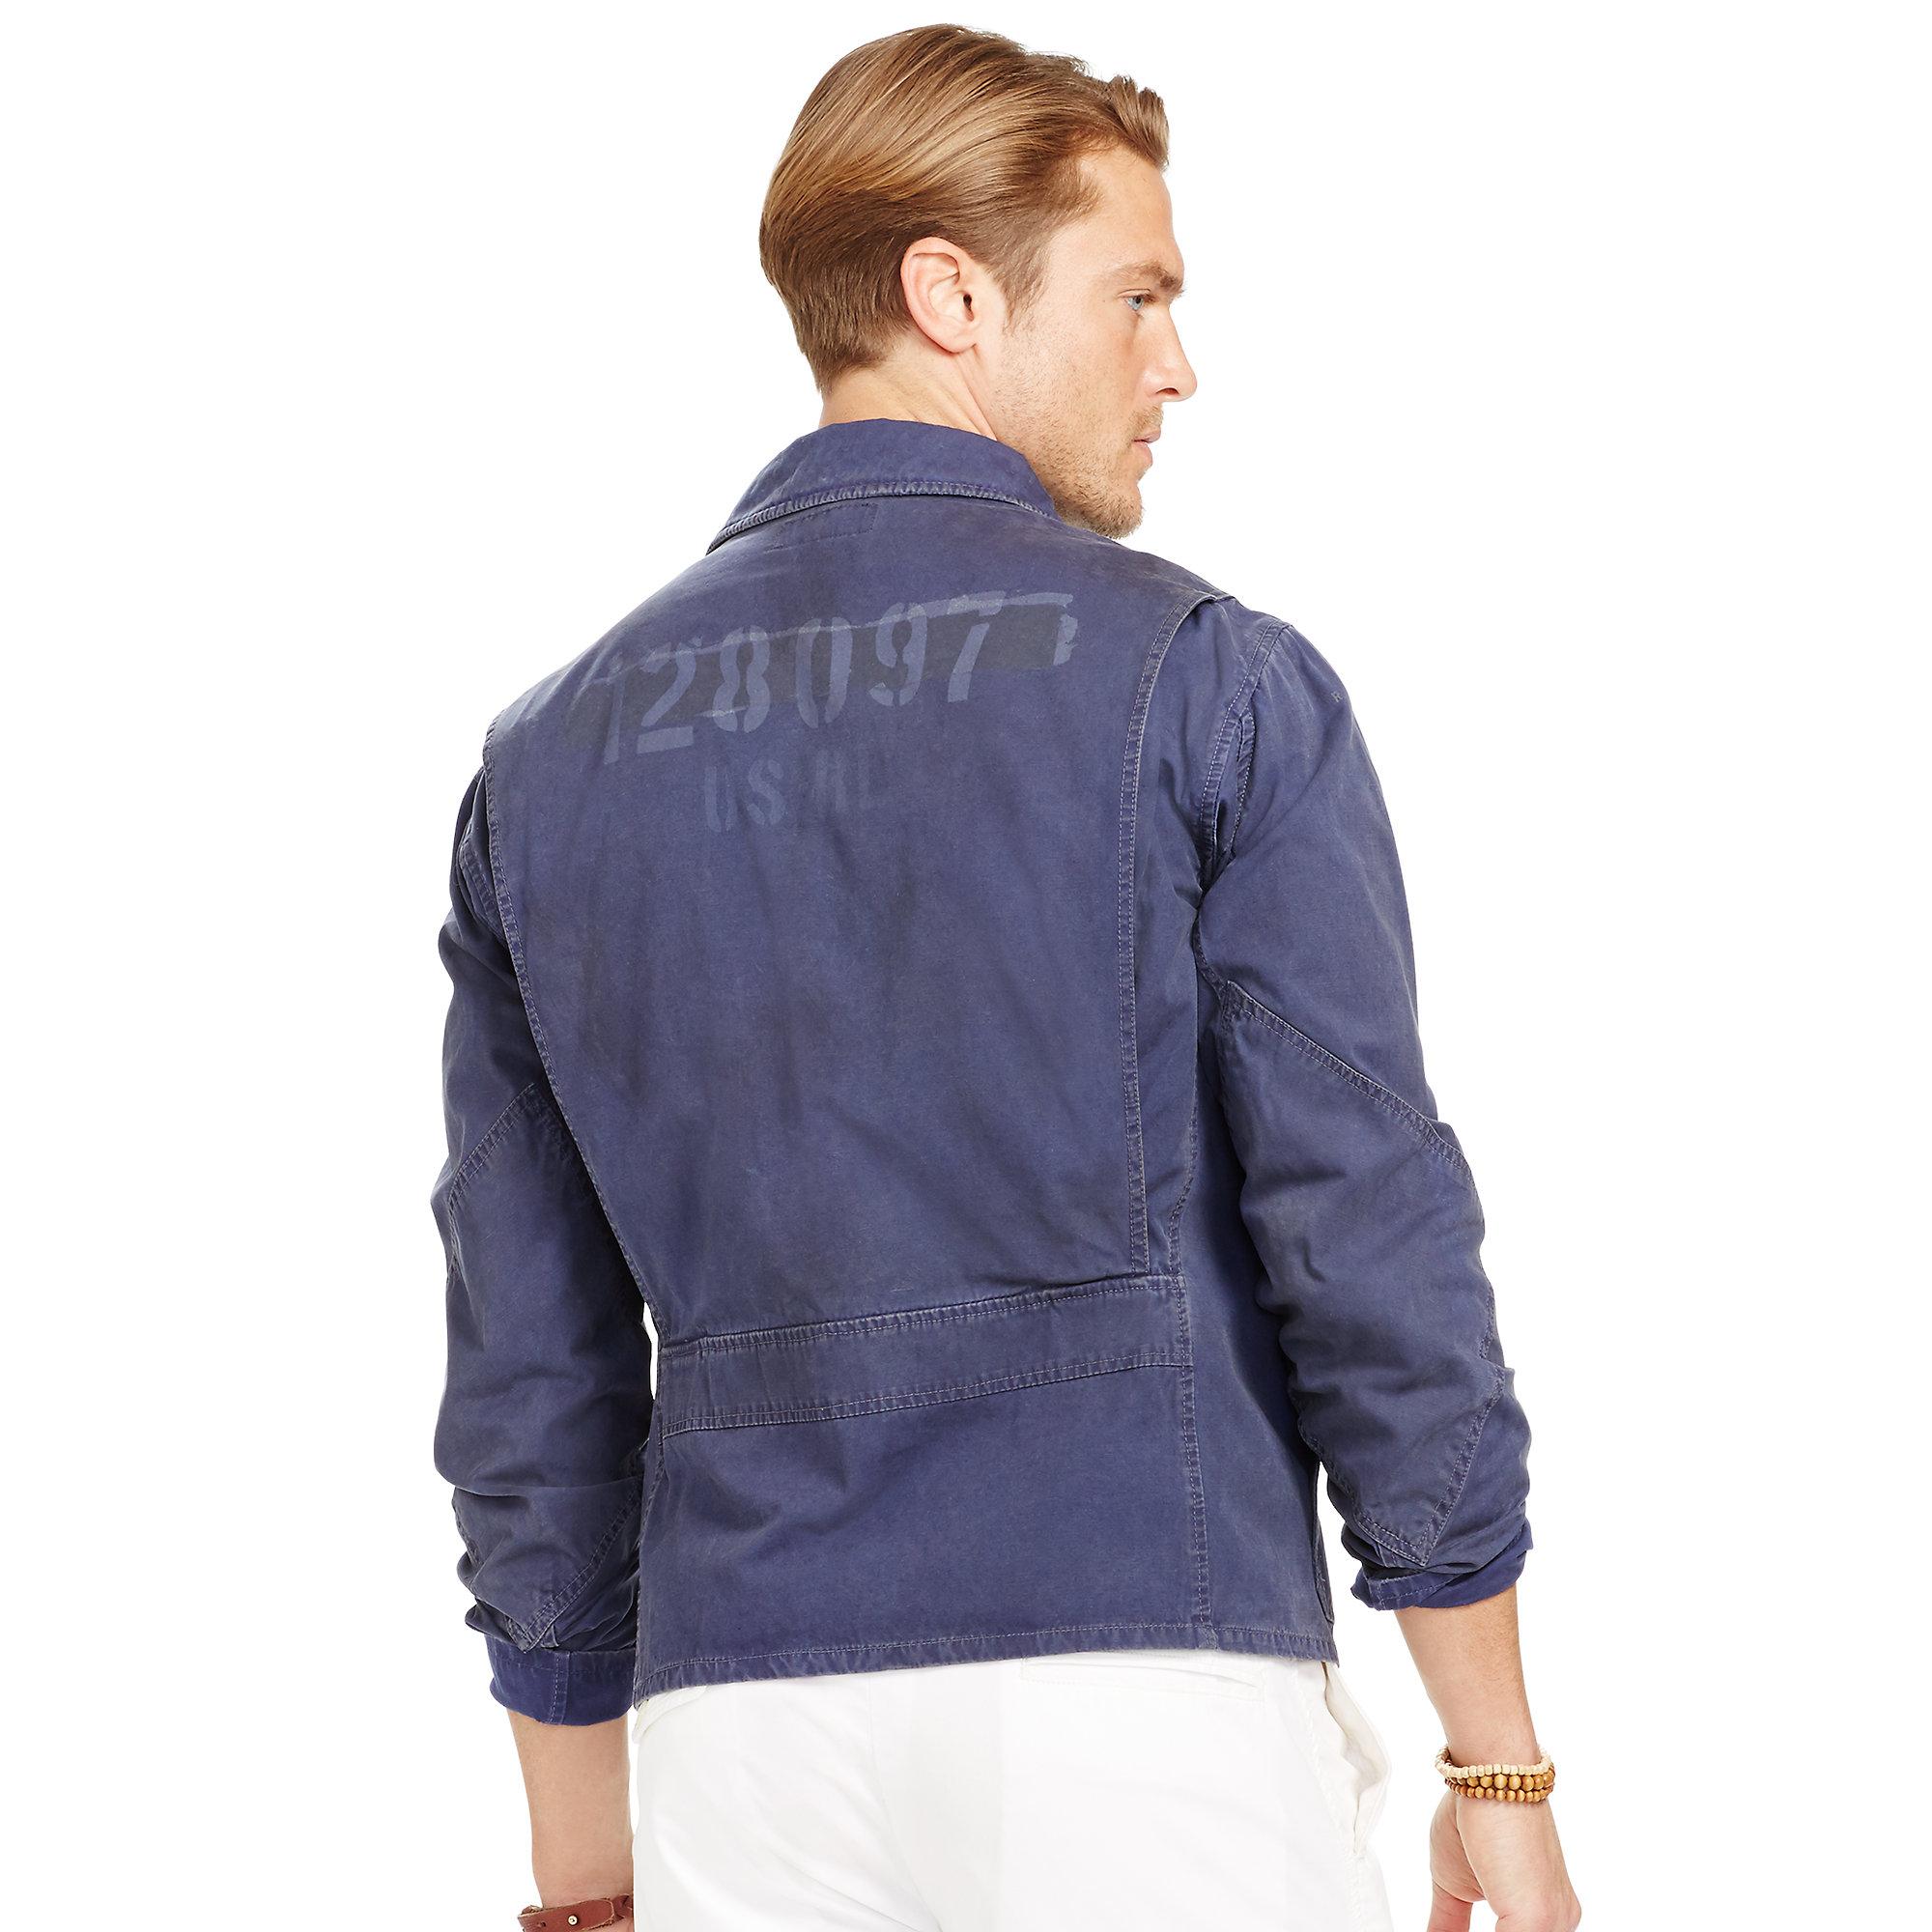 Polo ralph lauren Cotton Canvas Flight Jacket in Blue for Men | Lyst